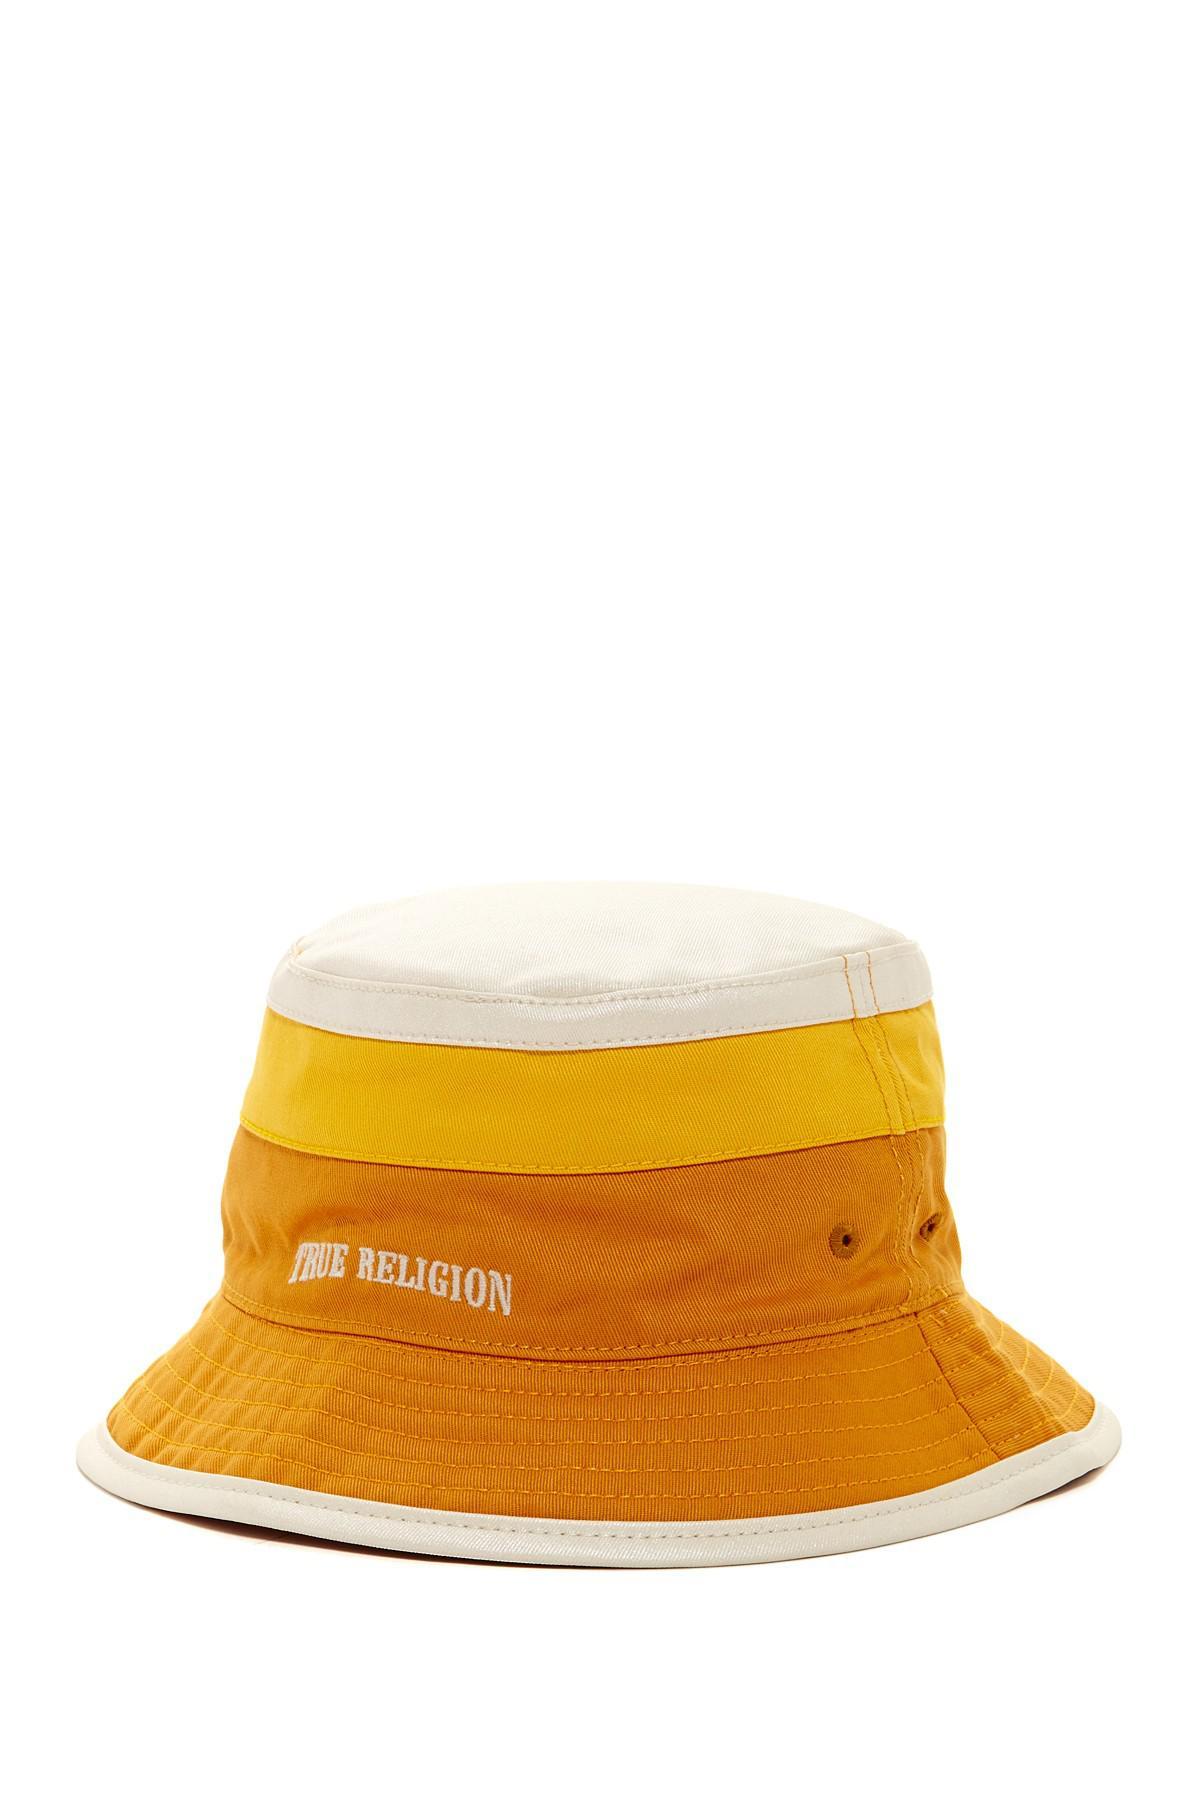 Lyst - True Religion Reversible Colorblock Bucket Hat in Yellow for Men 70040239b3f1